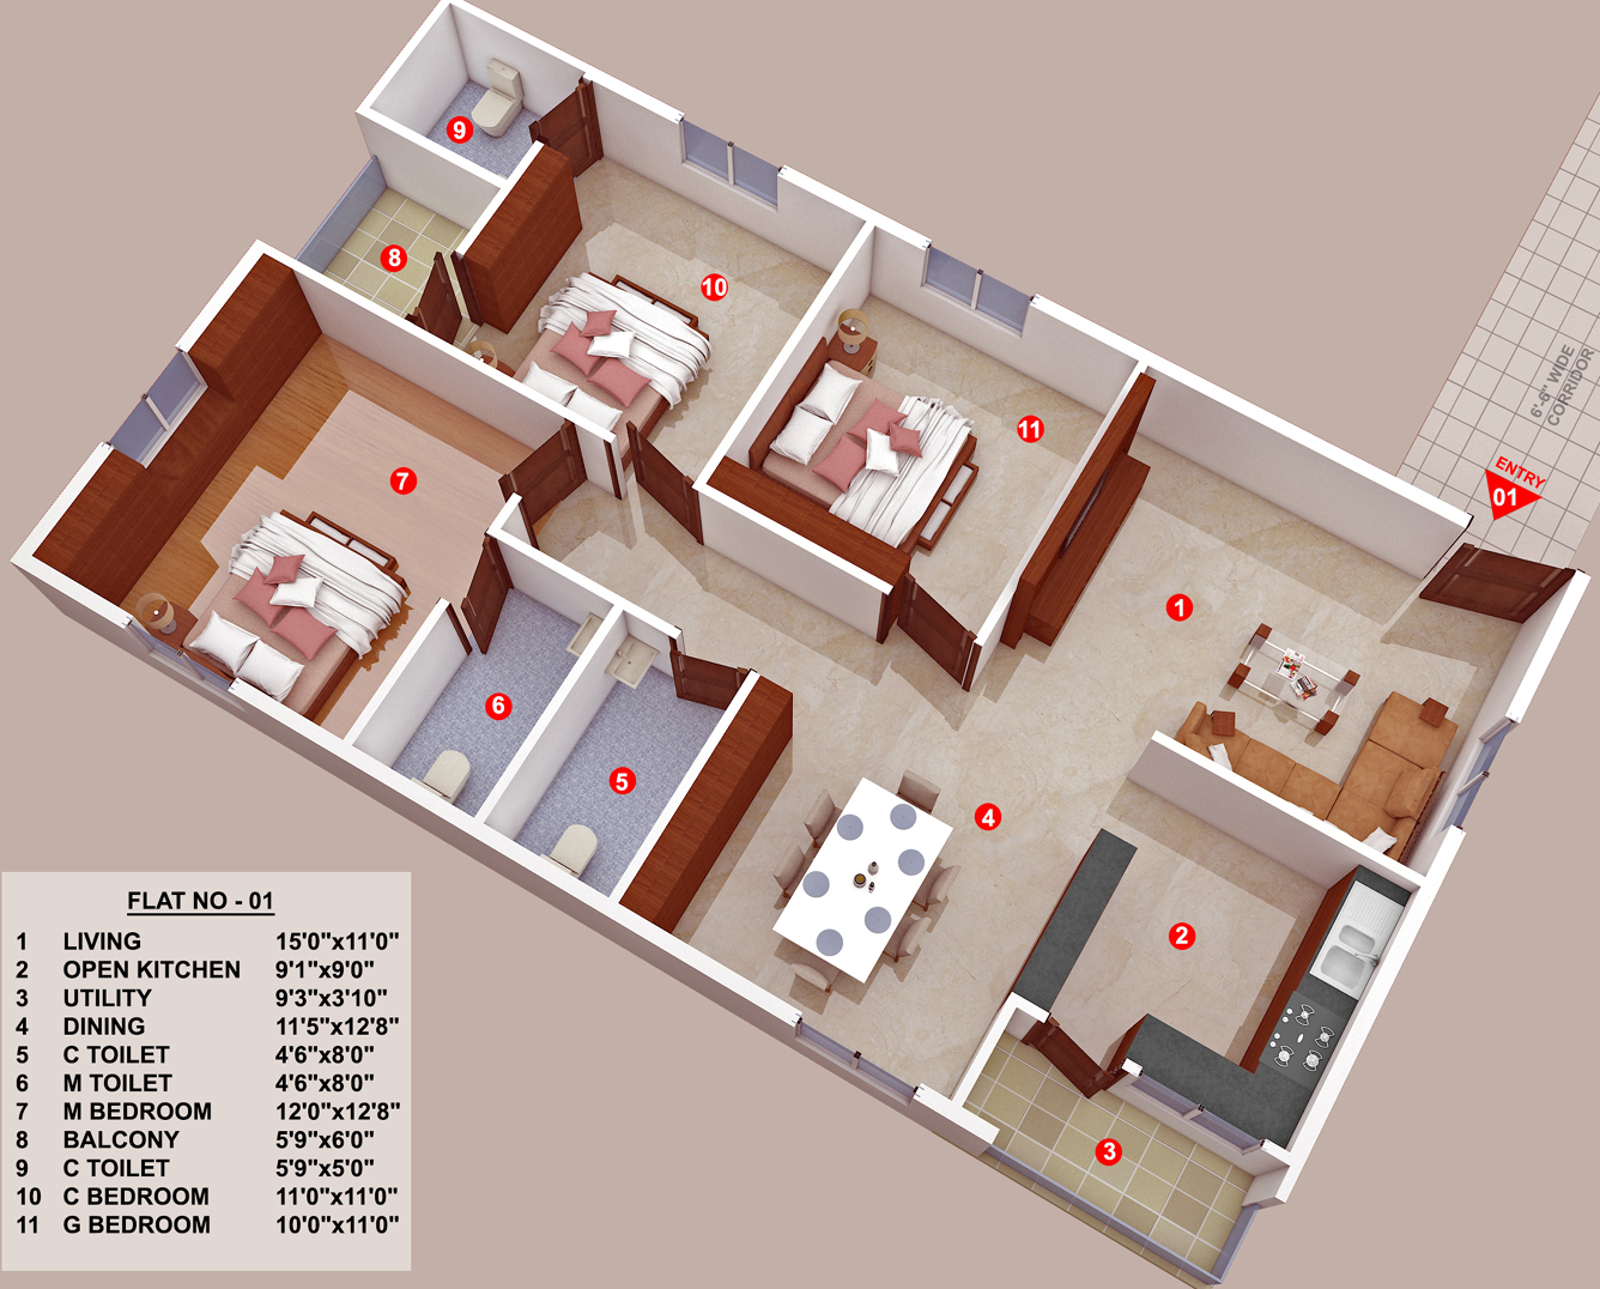 Star homes infratech sandhya in moti nagar hyderabad for Star home designs